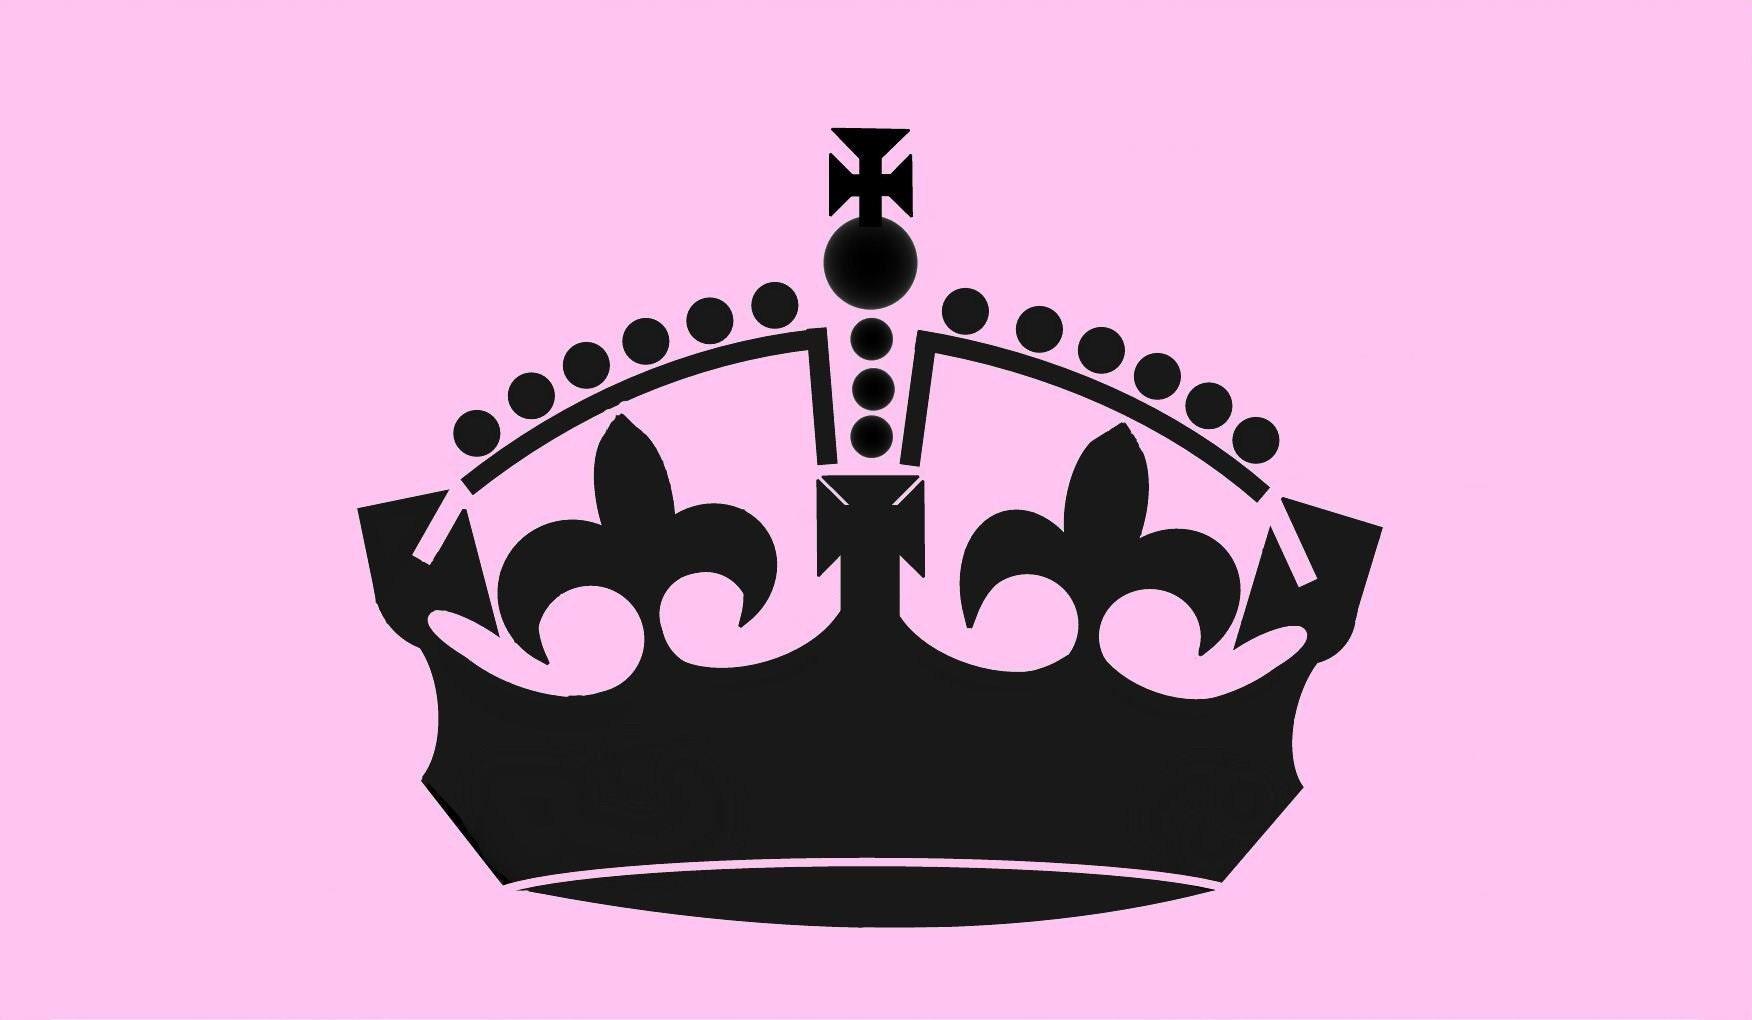 STENCIL Royal Crown 8x10 by ArtisticStencils on Etsy